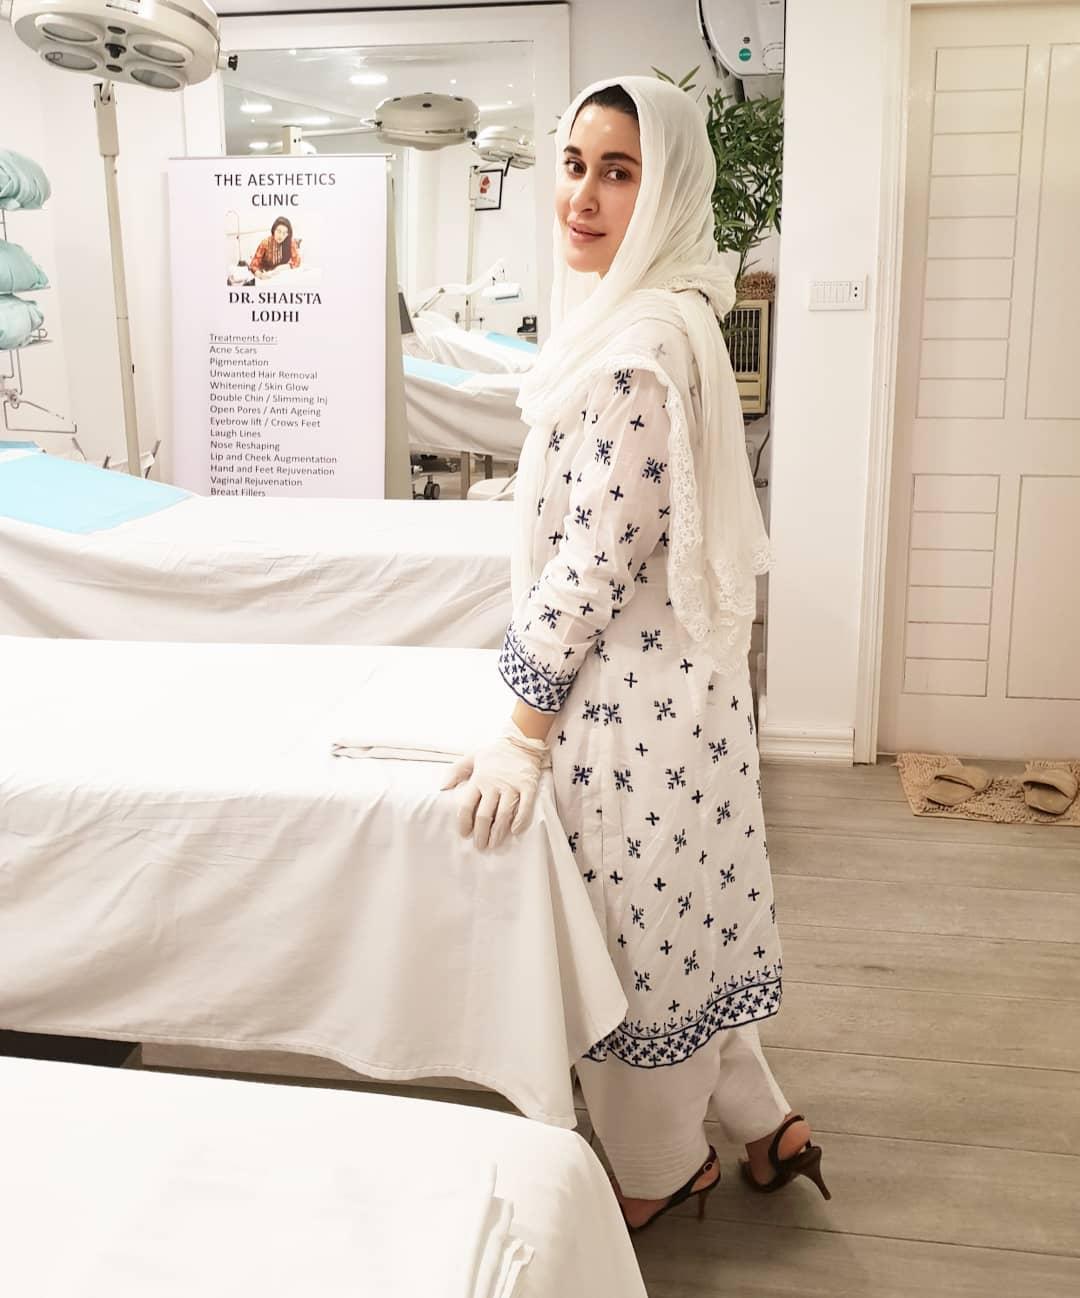 Benita David Getting Botox Treatment from Dr shaista Lodhi